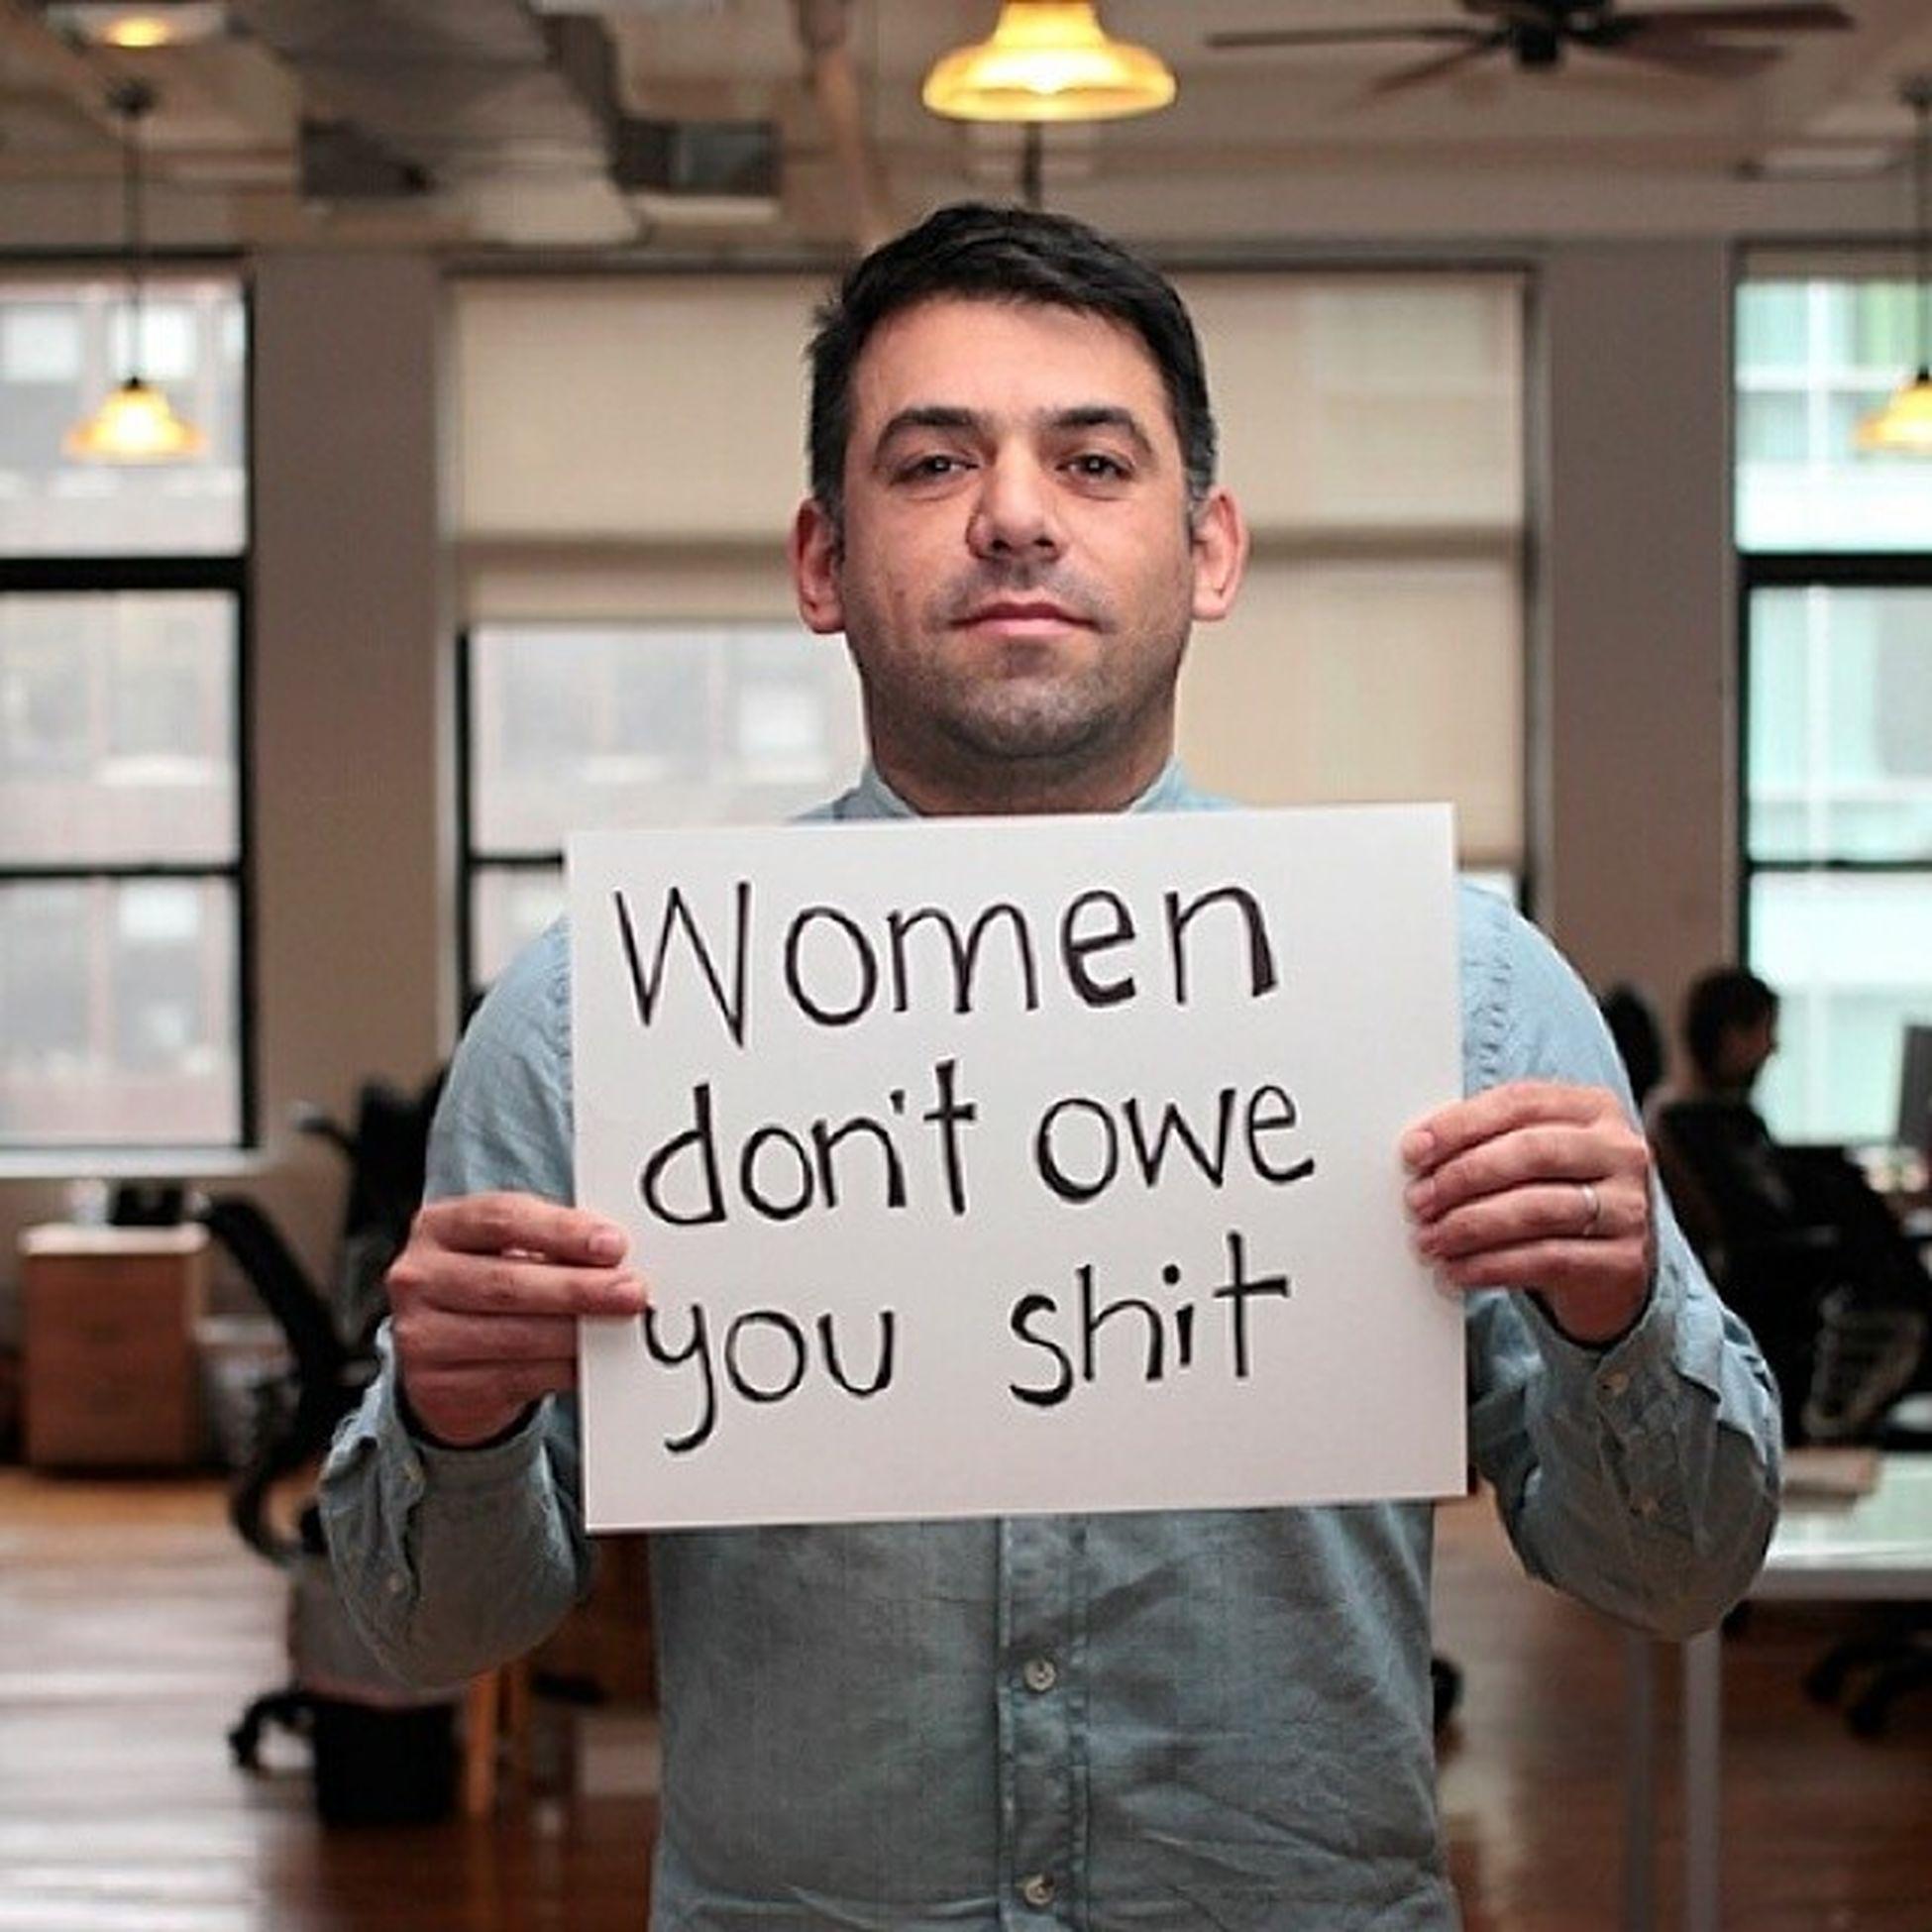 Yesallwomen Amen